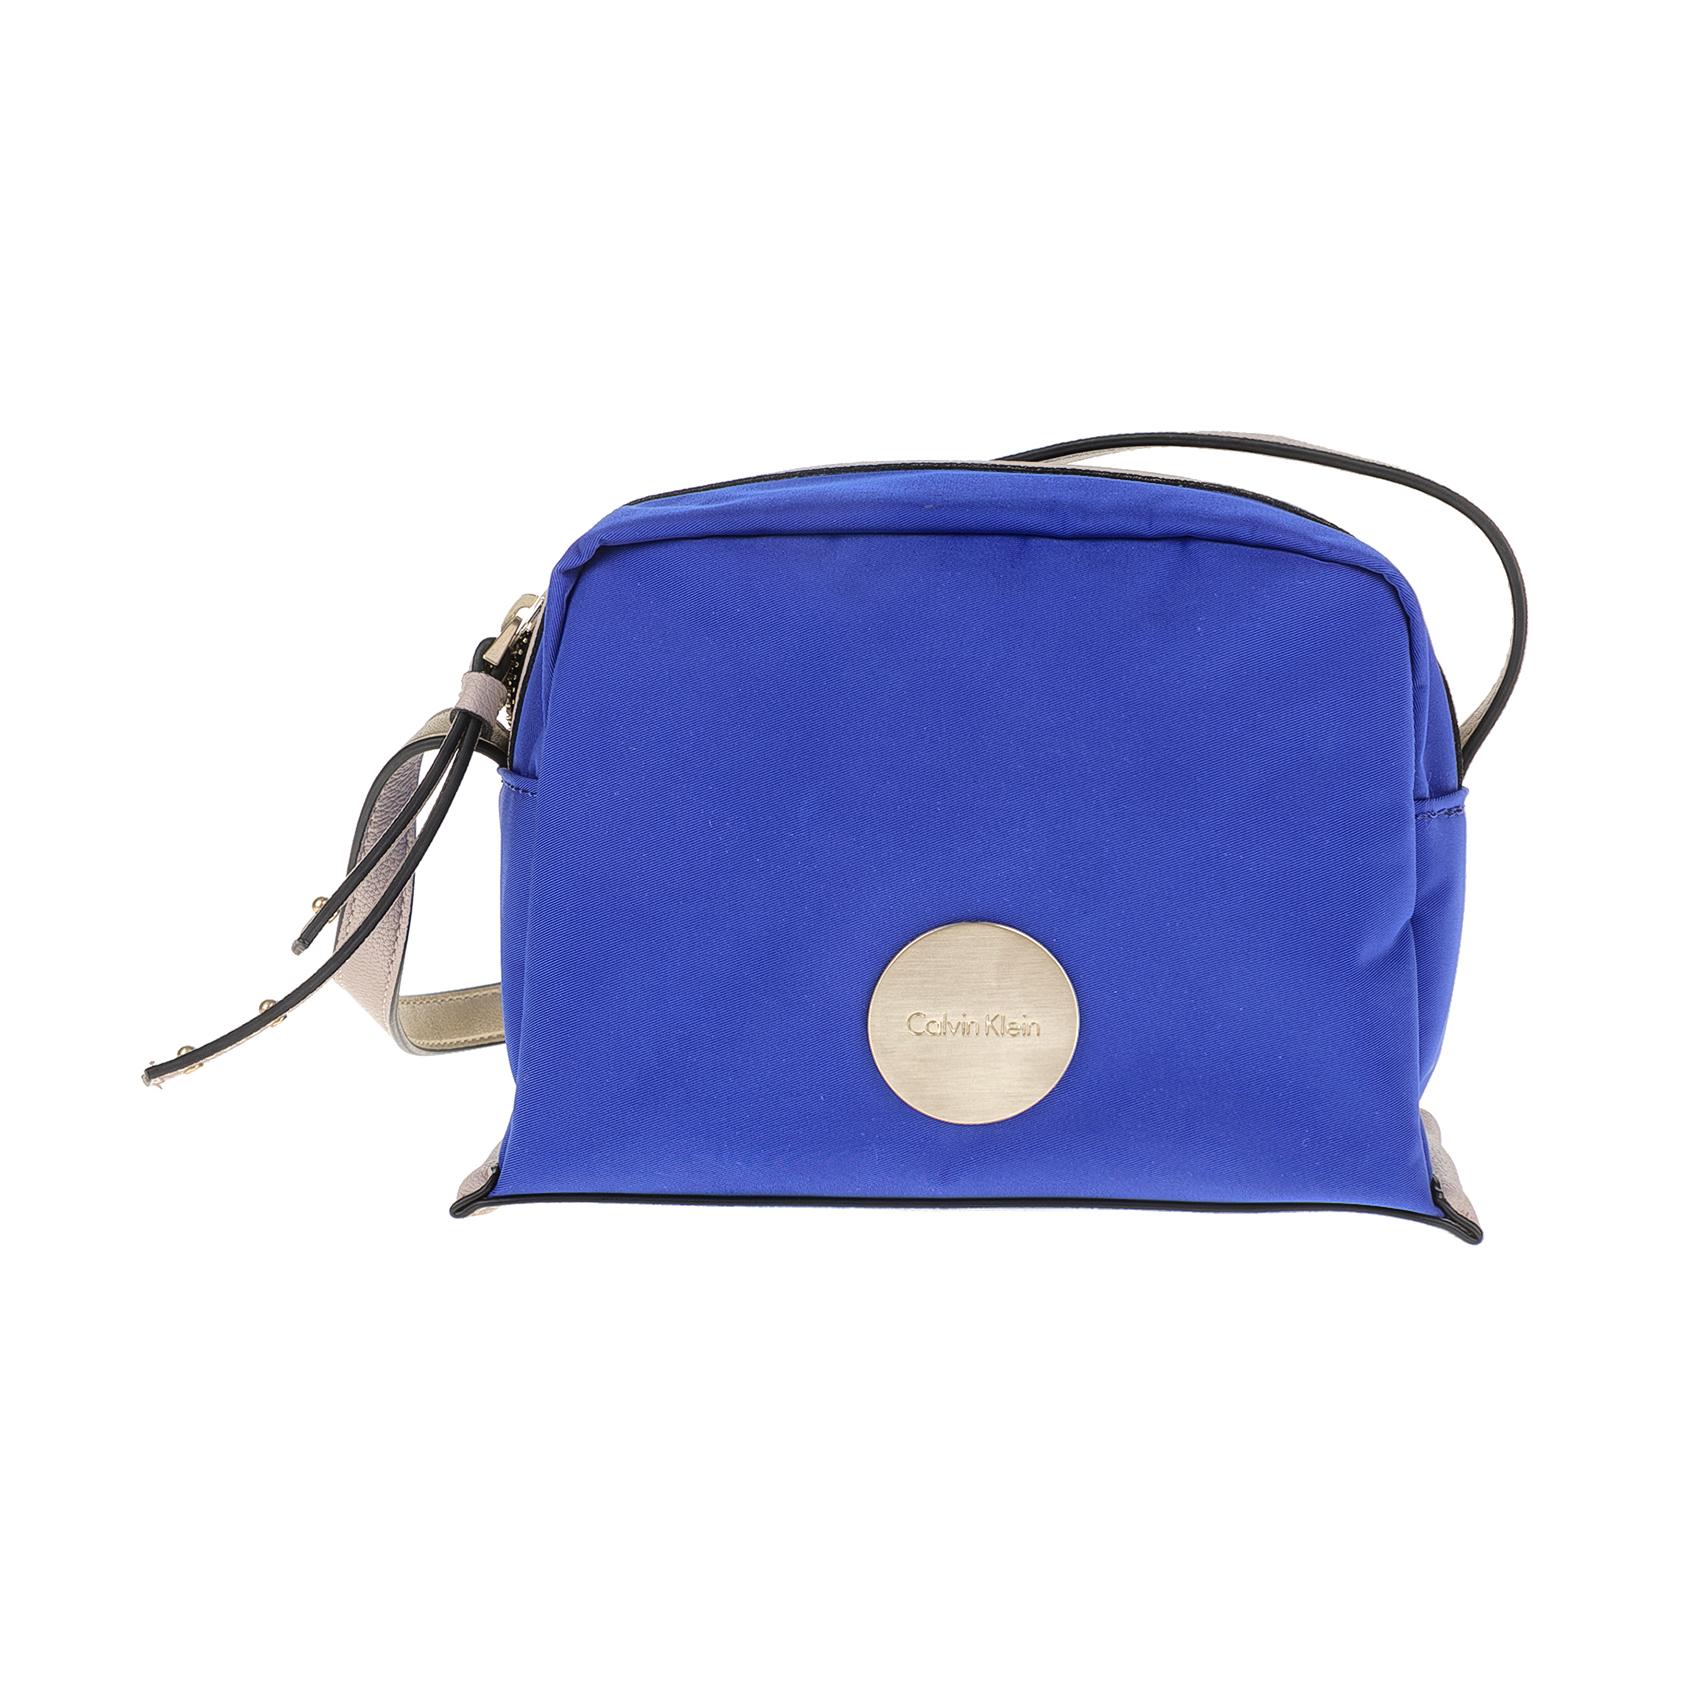 CALVIN KLEIN JEANS - Γυναικεία τσάντα CALVIN KLEIN JEANS EDITH SMALL μπλε γυναικεία αξεσουάρ τσάντες σακίδια χιαστή   cross body